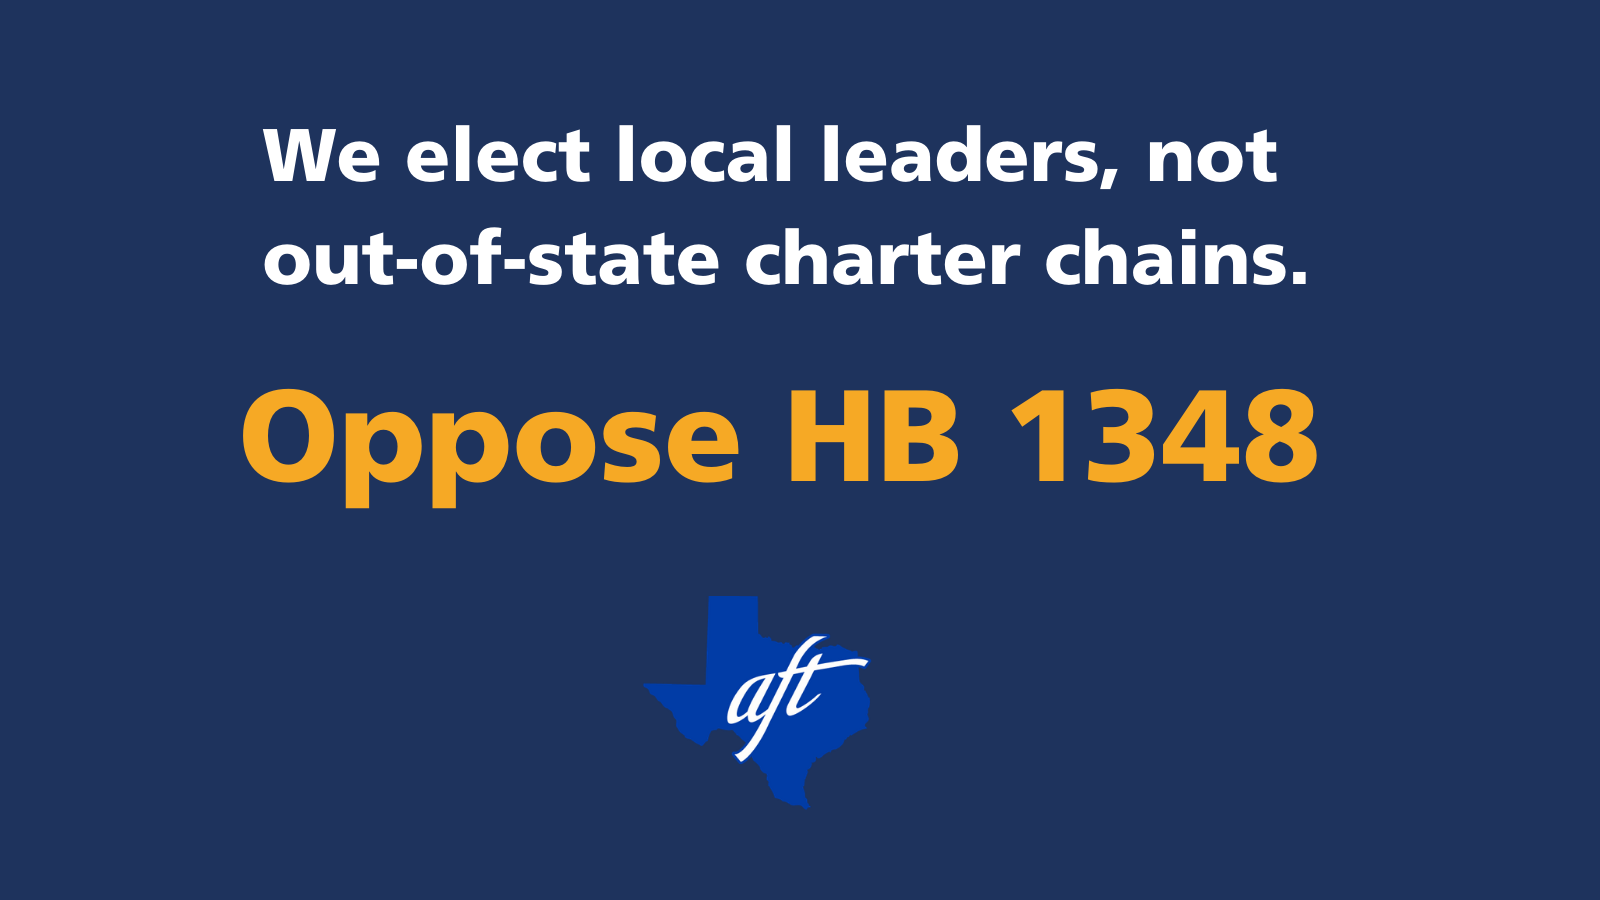 Oppose HB 1348 banner